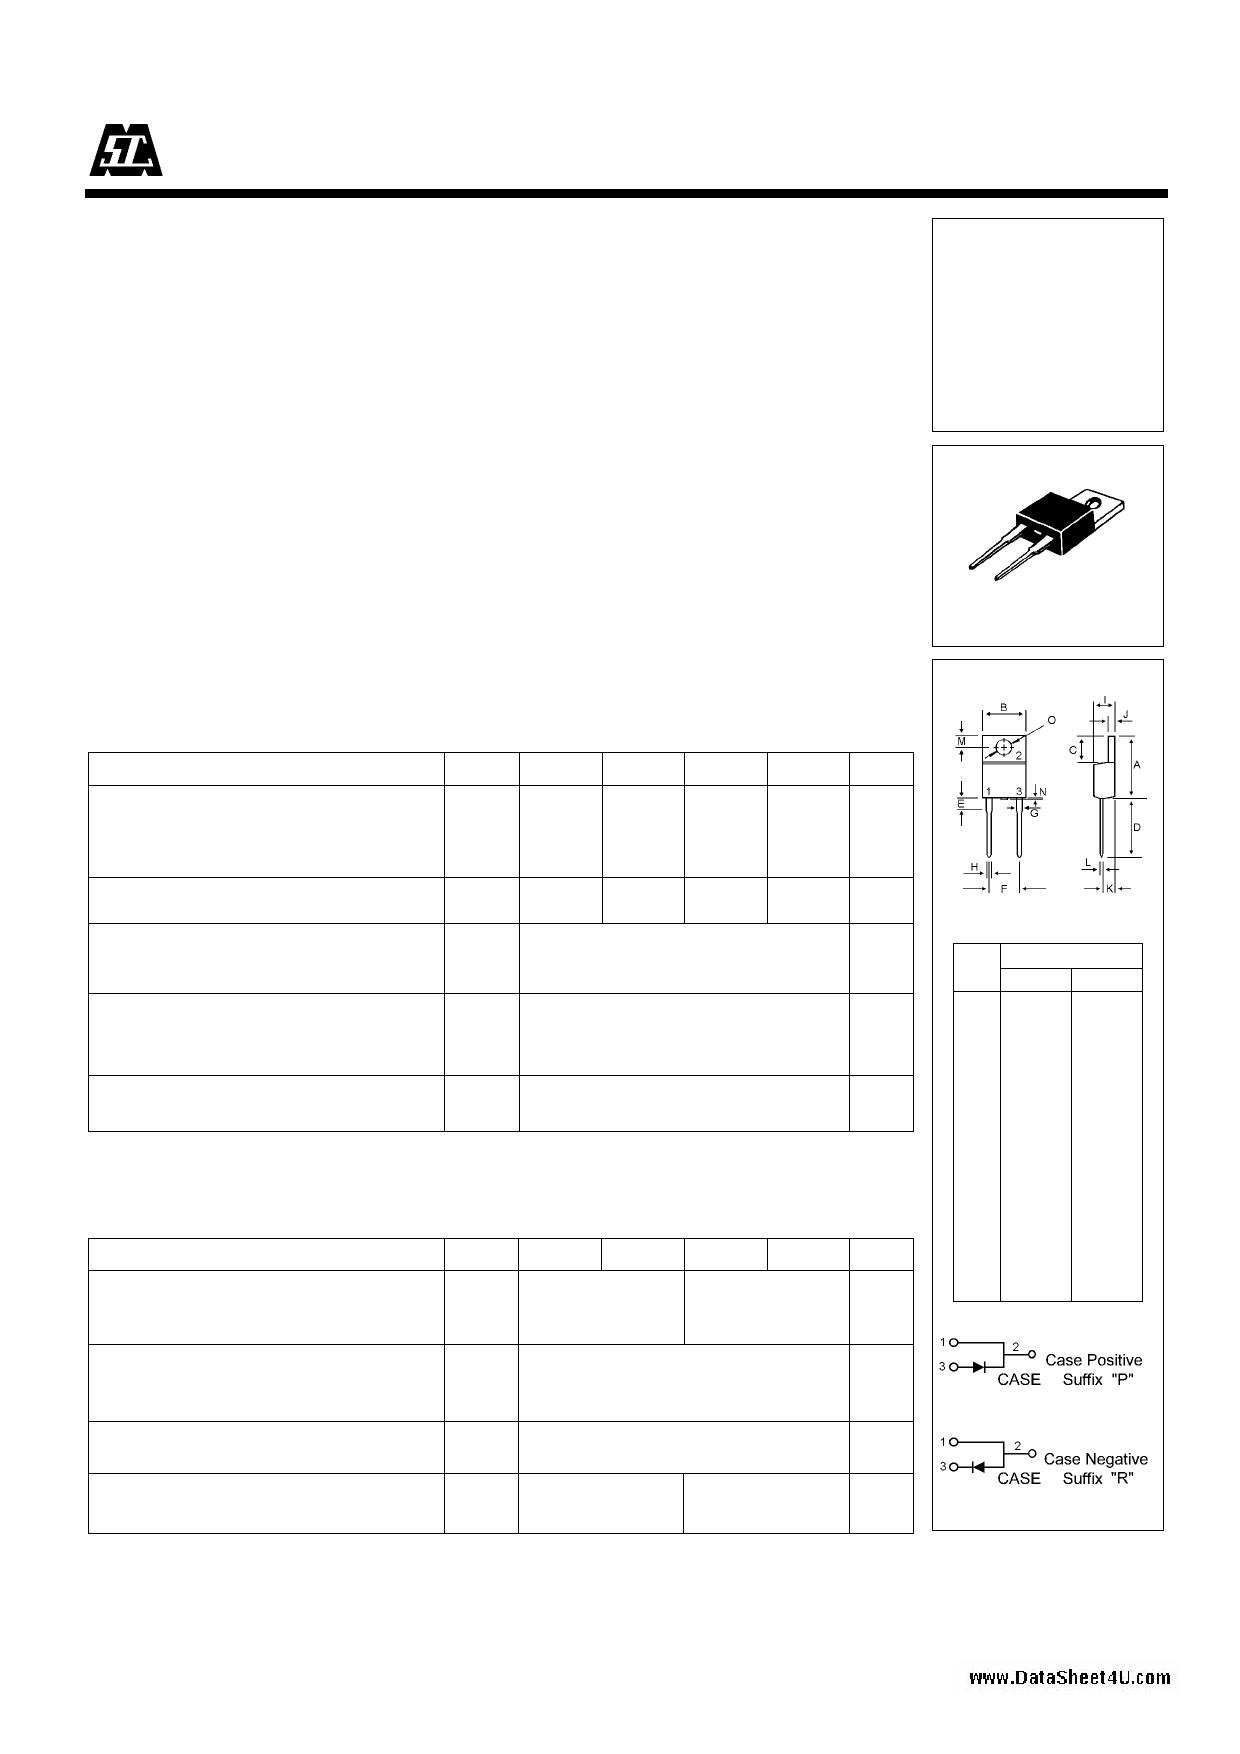 U05A30 datasheet